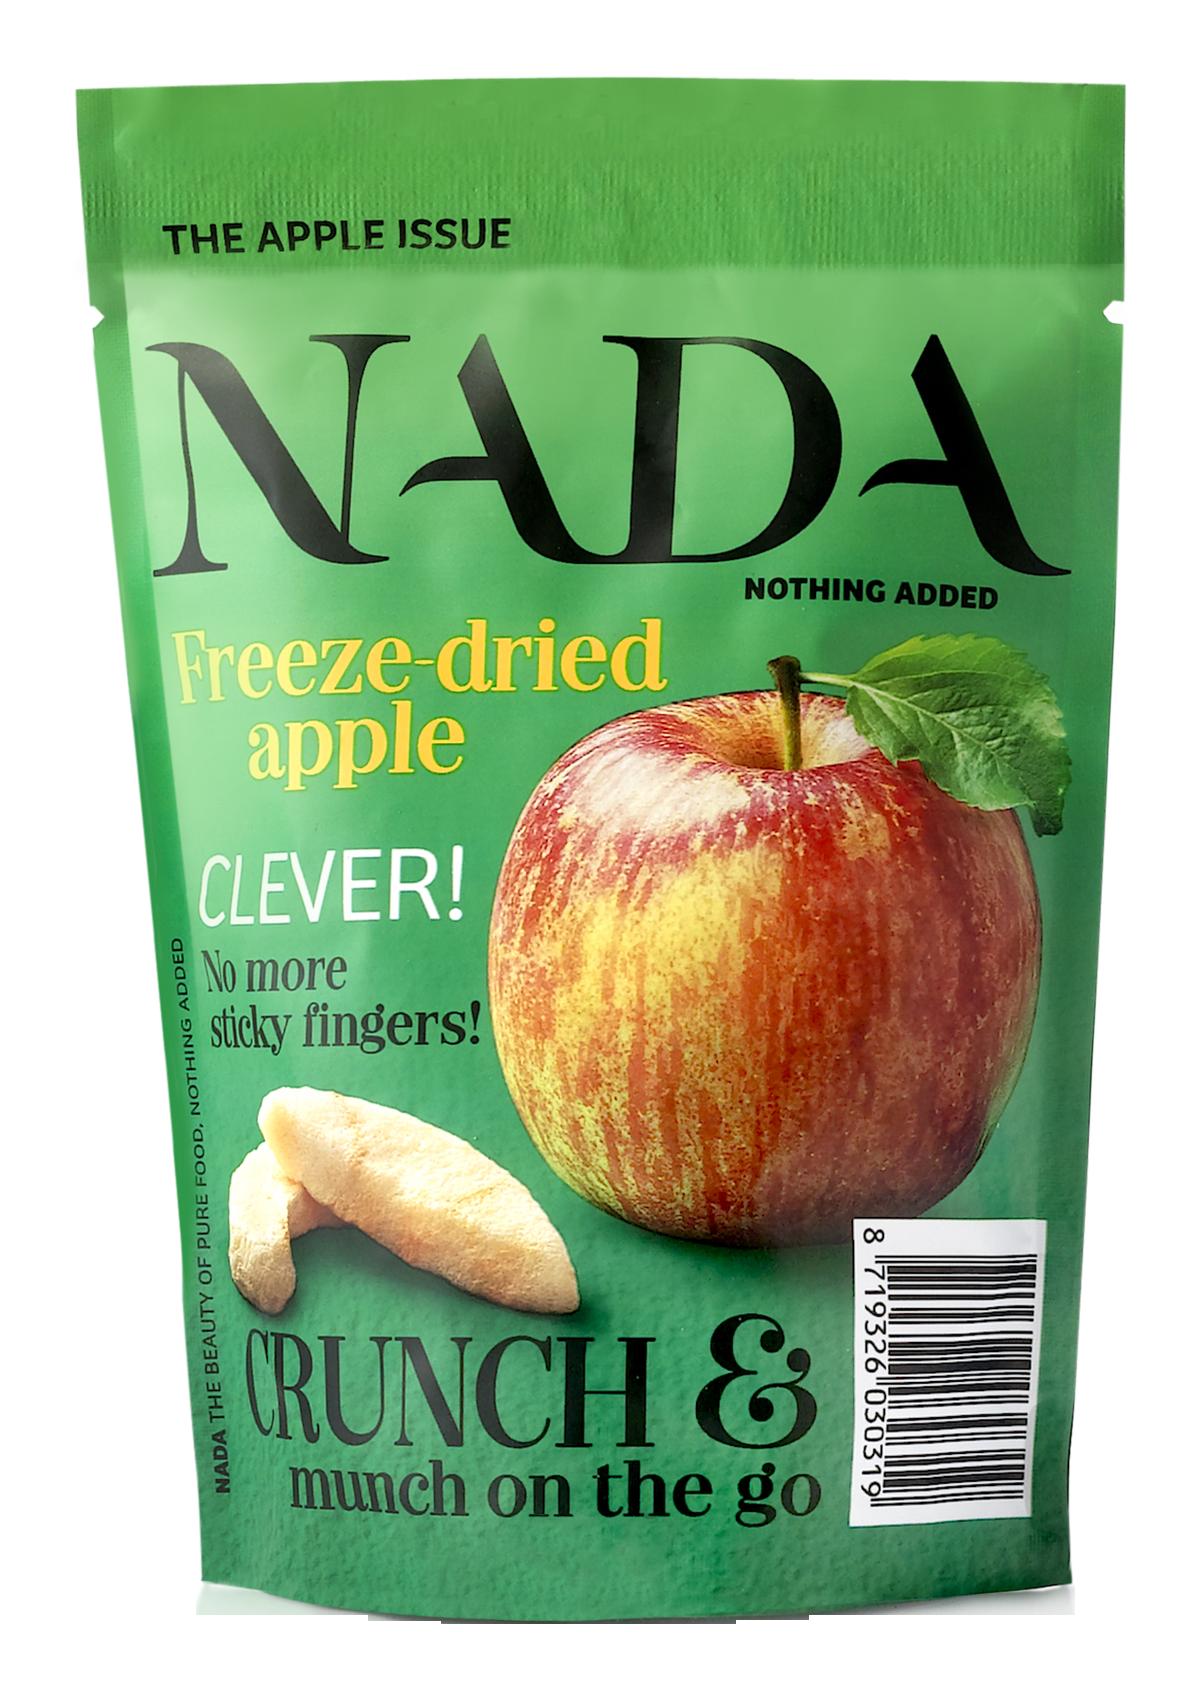 NADA freeze-dried apple